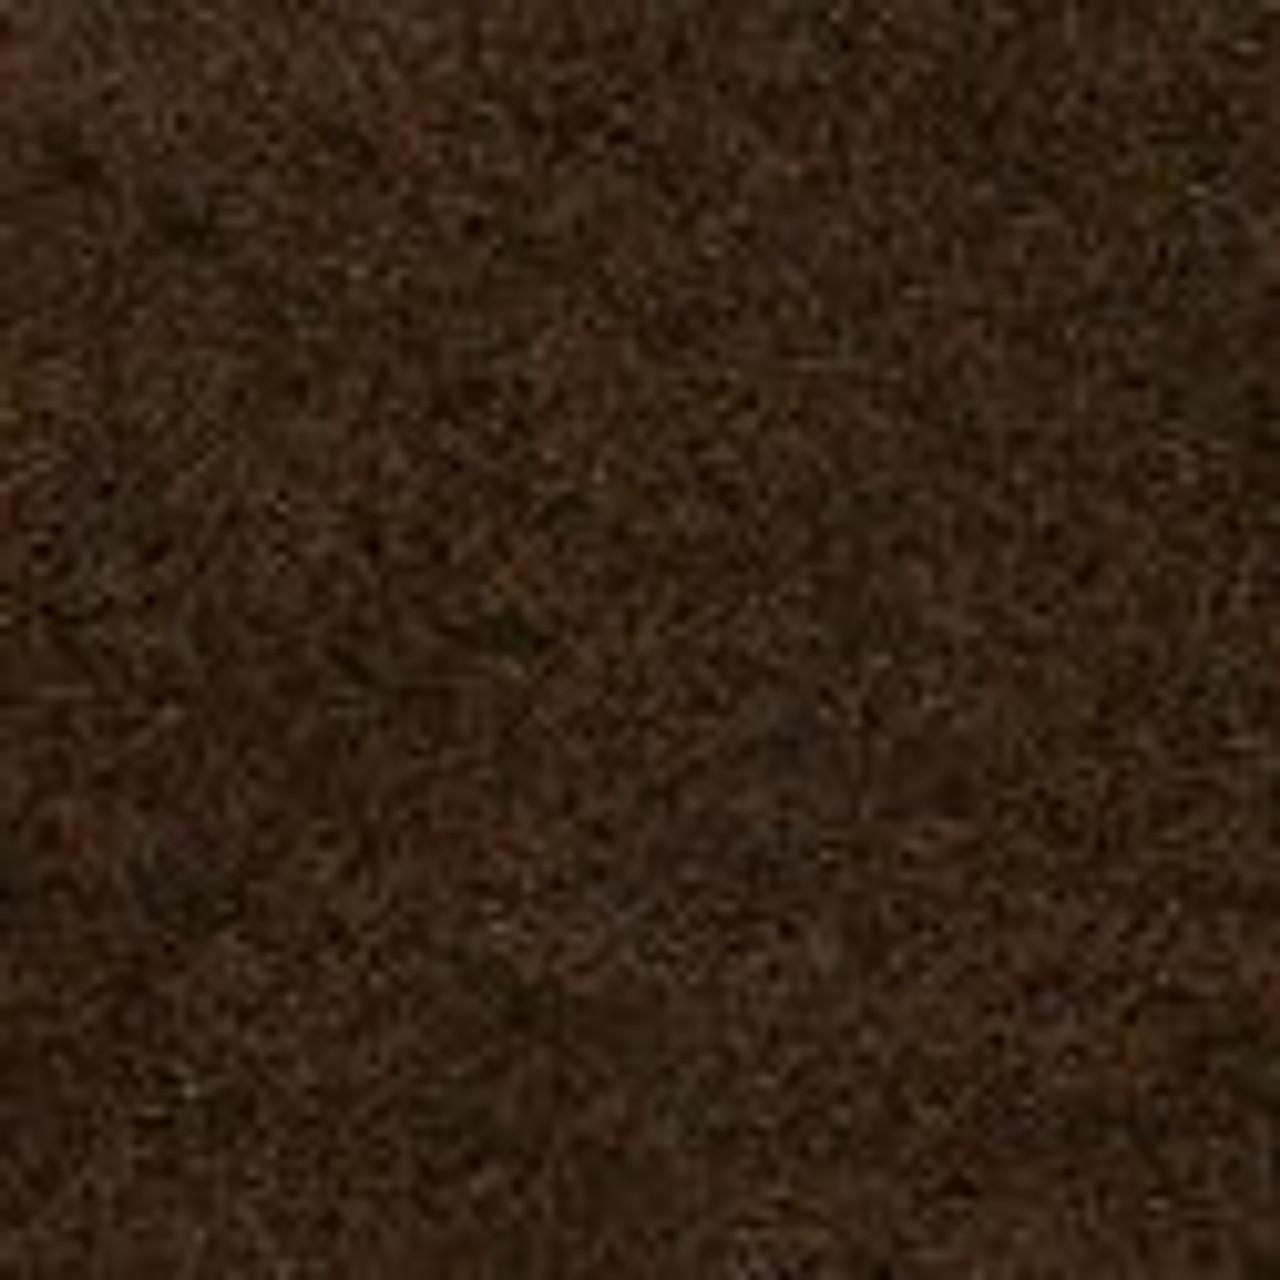 "AQUA-TURF Cocoa Marine Carpet 72"" - Sold by the Yard"